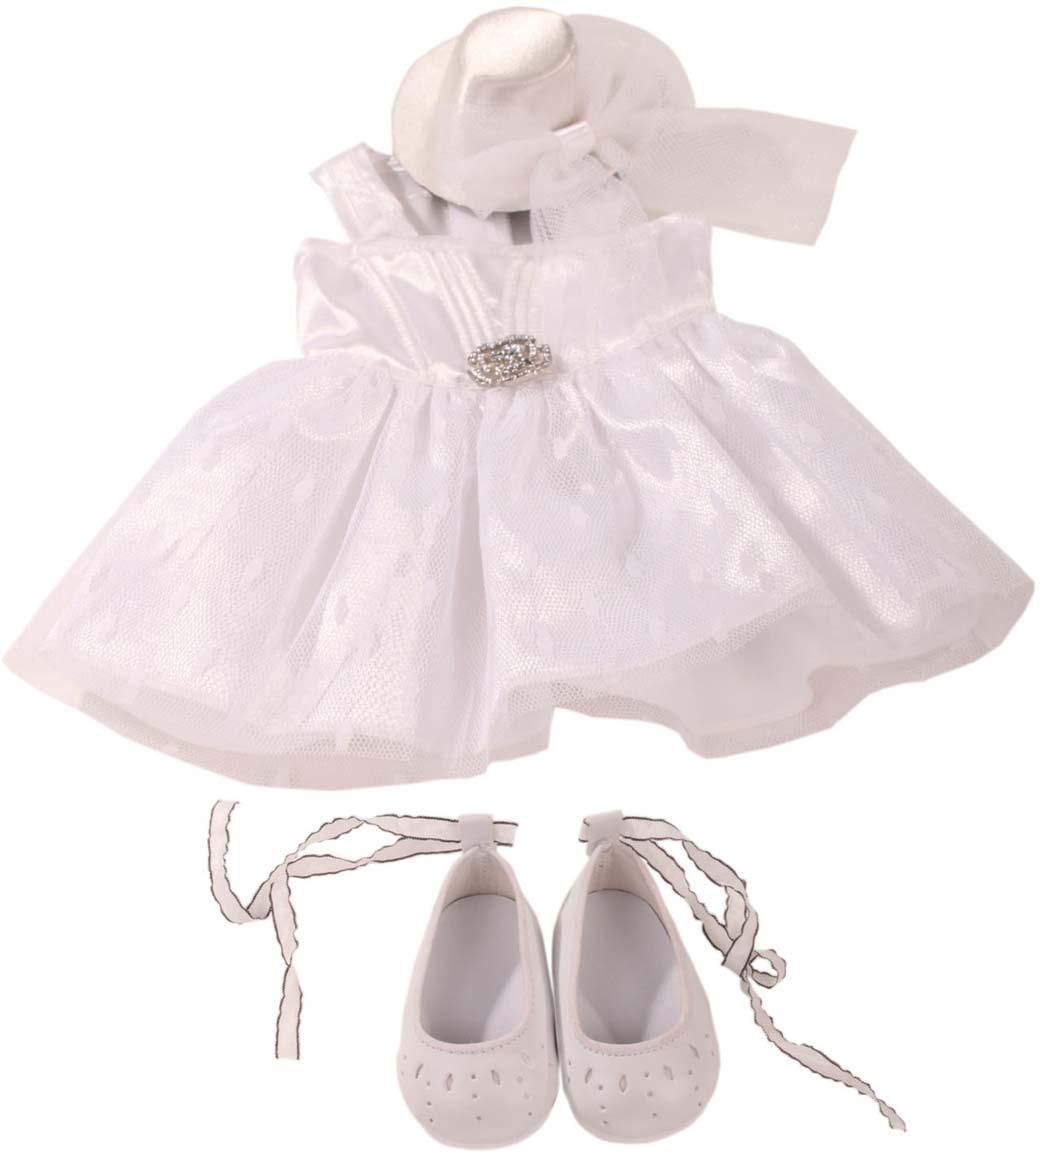 Gotz Одежда для кукол Вечернее платье вечернее платье fragrant luner lf30